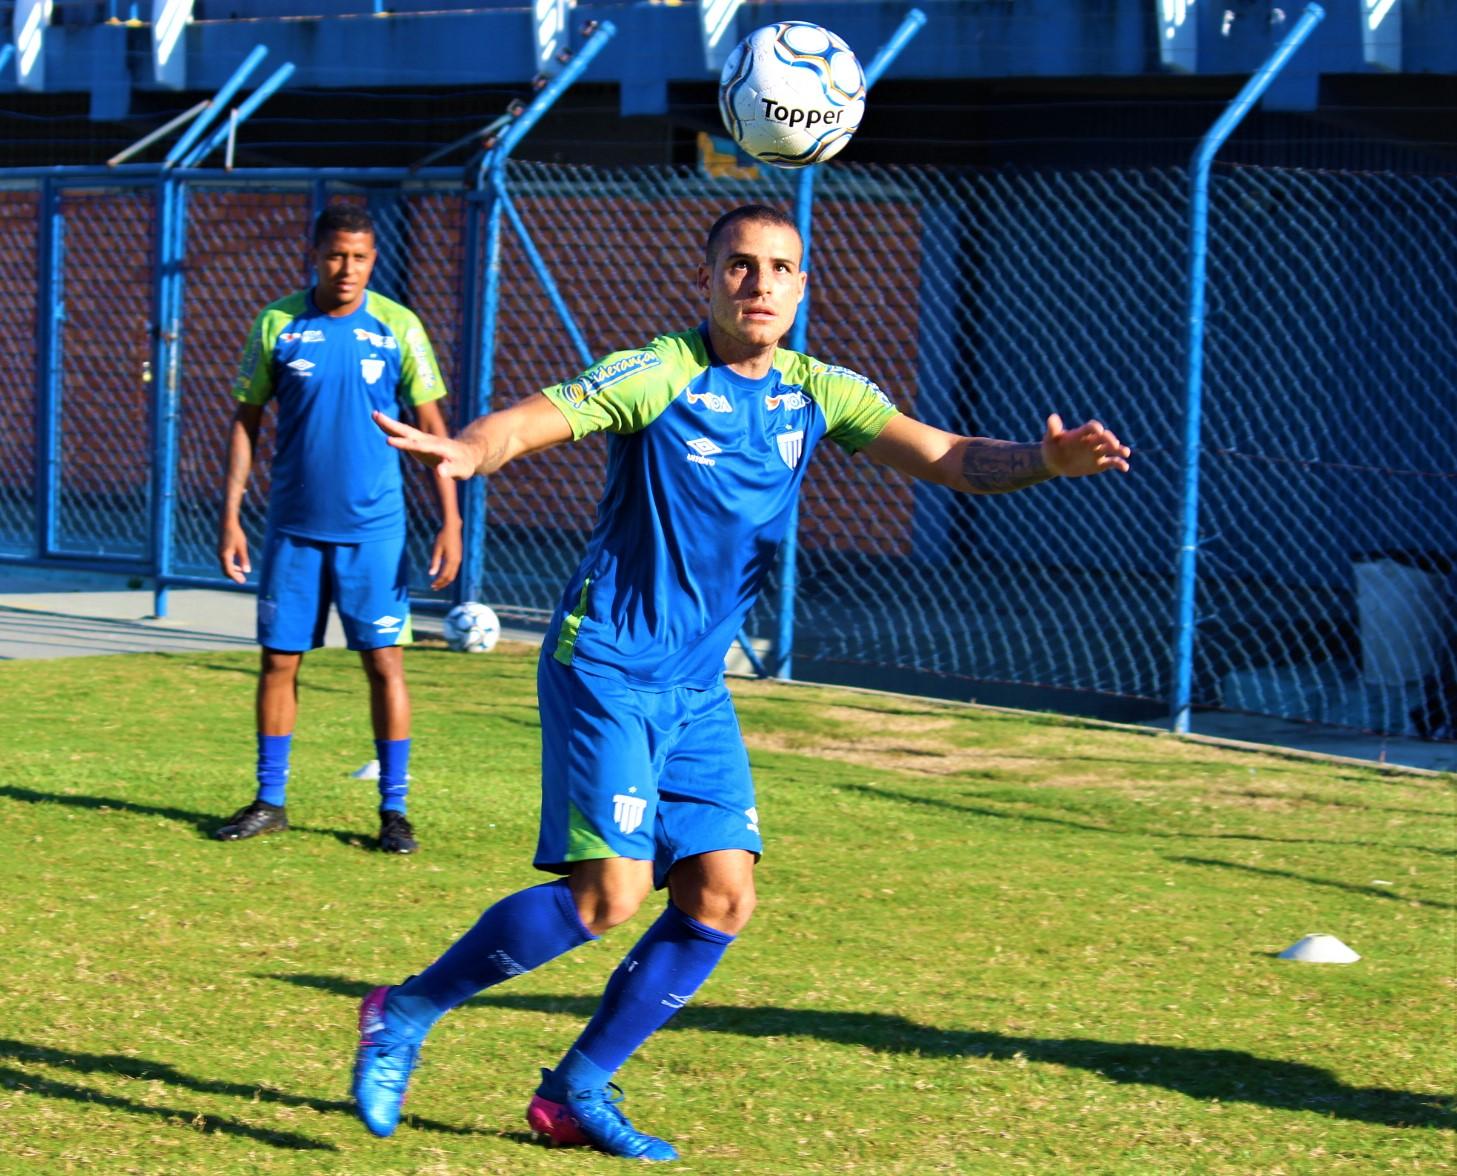 39f40ad6dd Avaí Futebol Clube » Avaí começa caminhada rumo à elite diante do ...